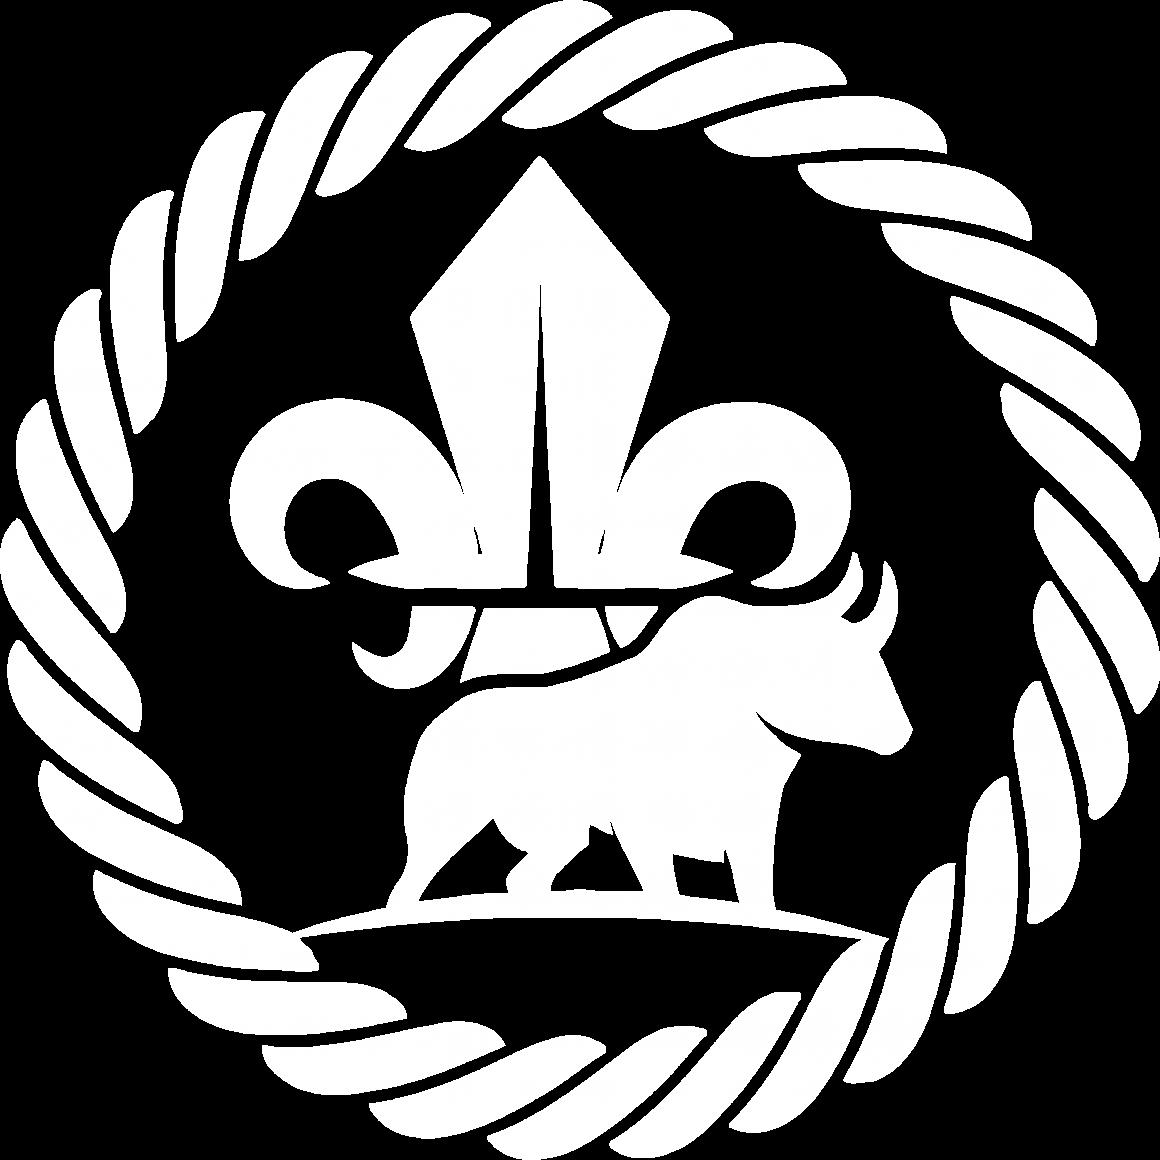 De Voerman logo 2020 - Wit met transparante achtergrond